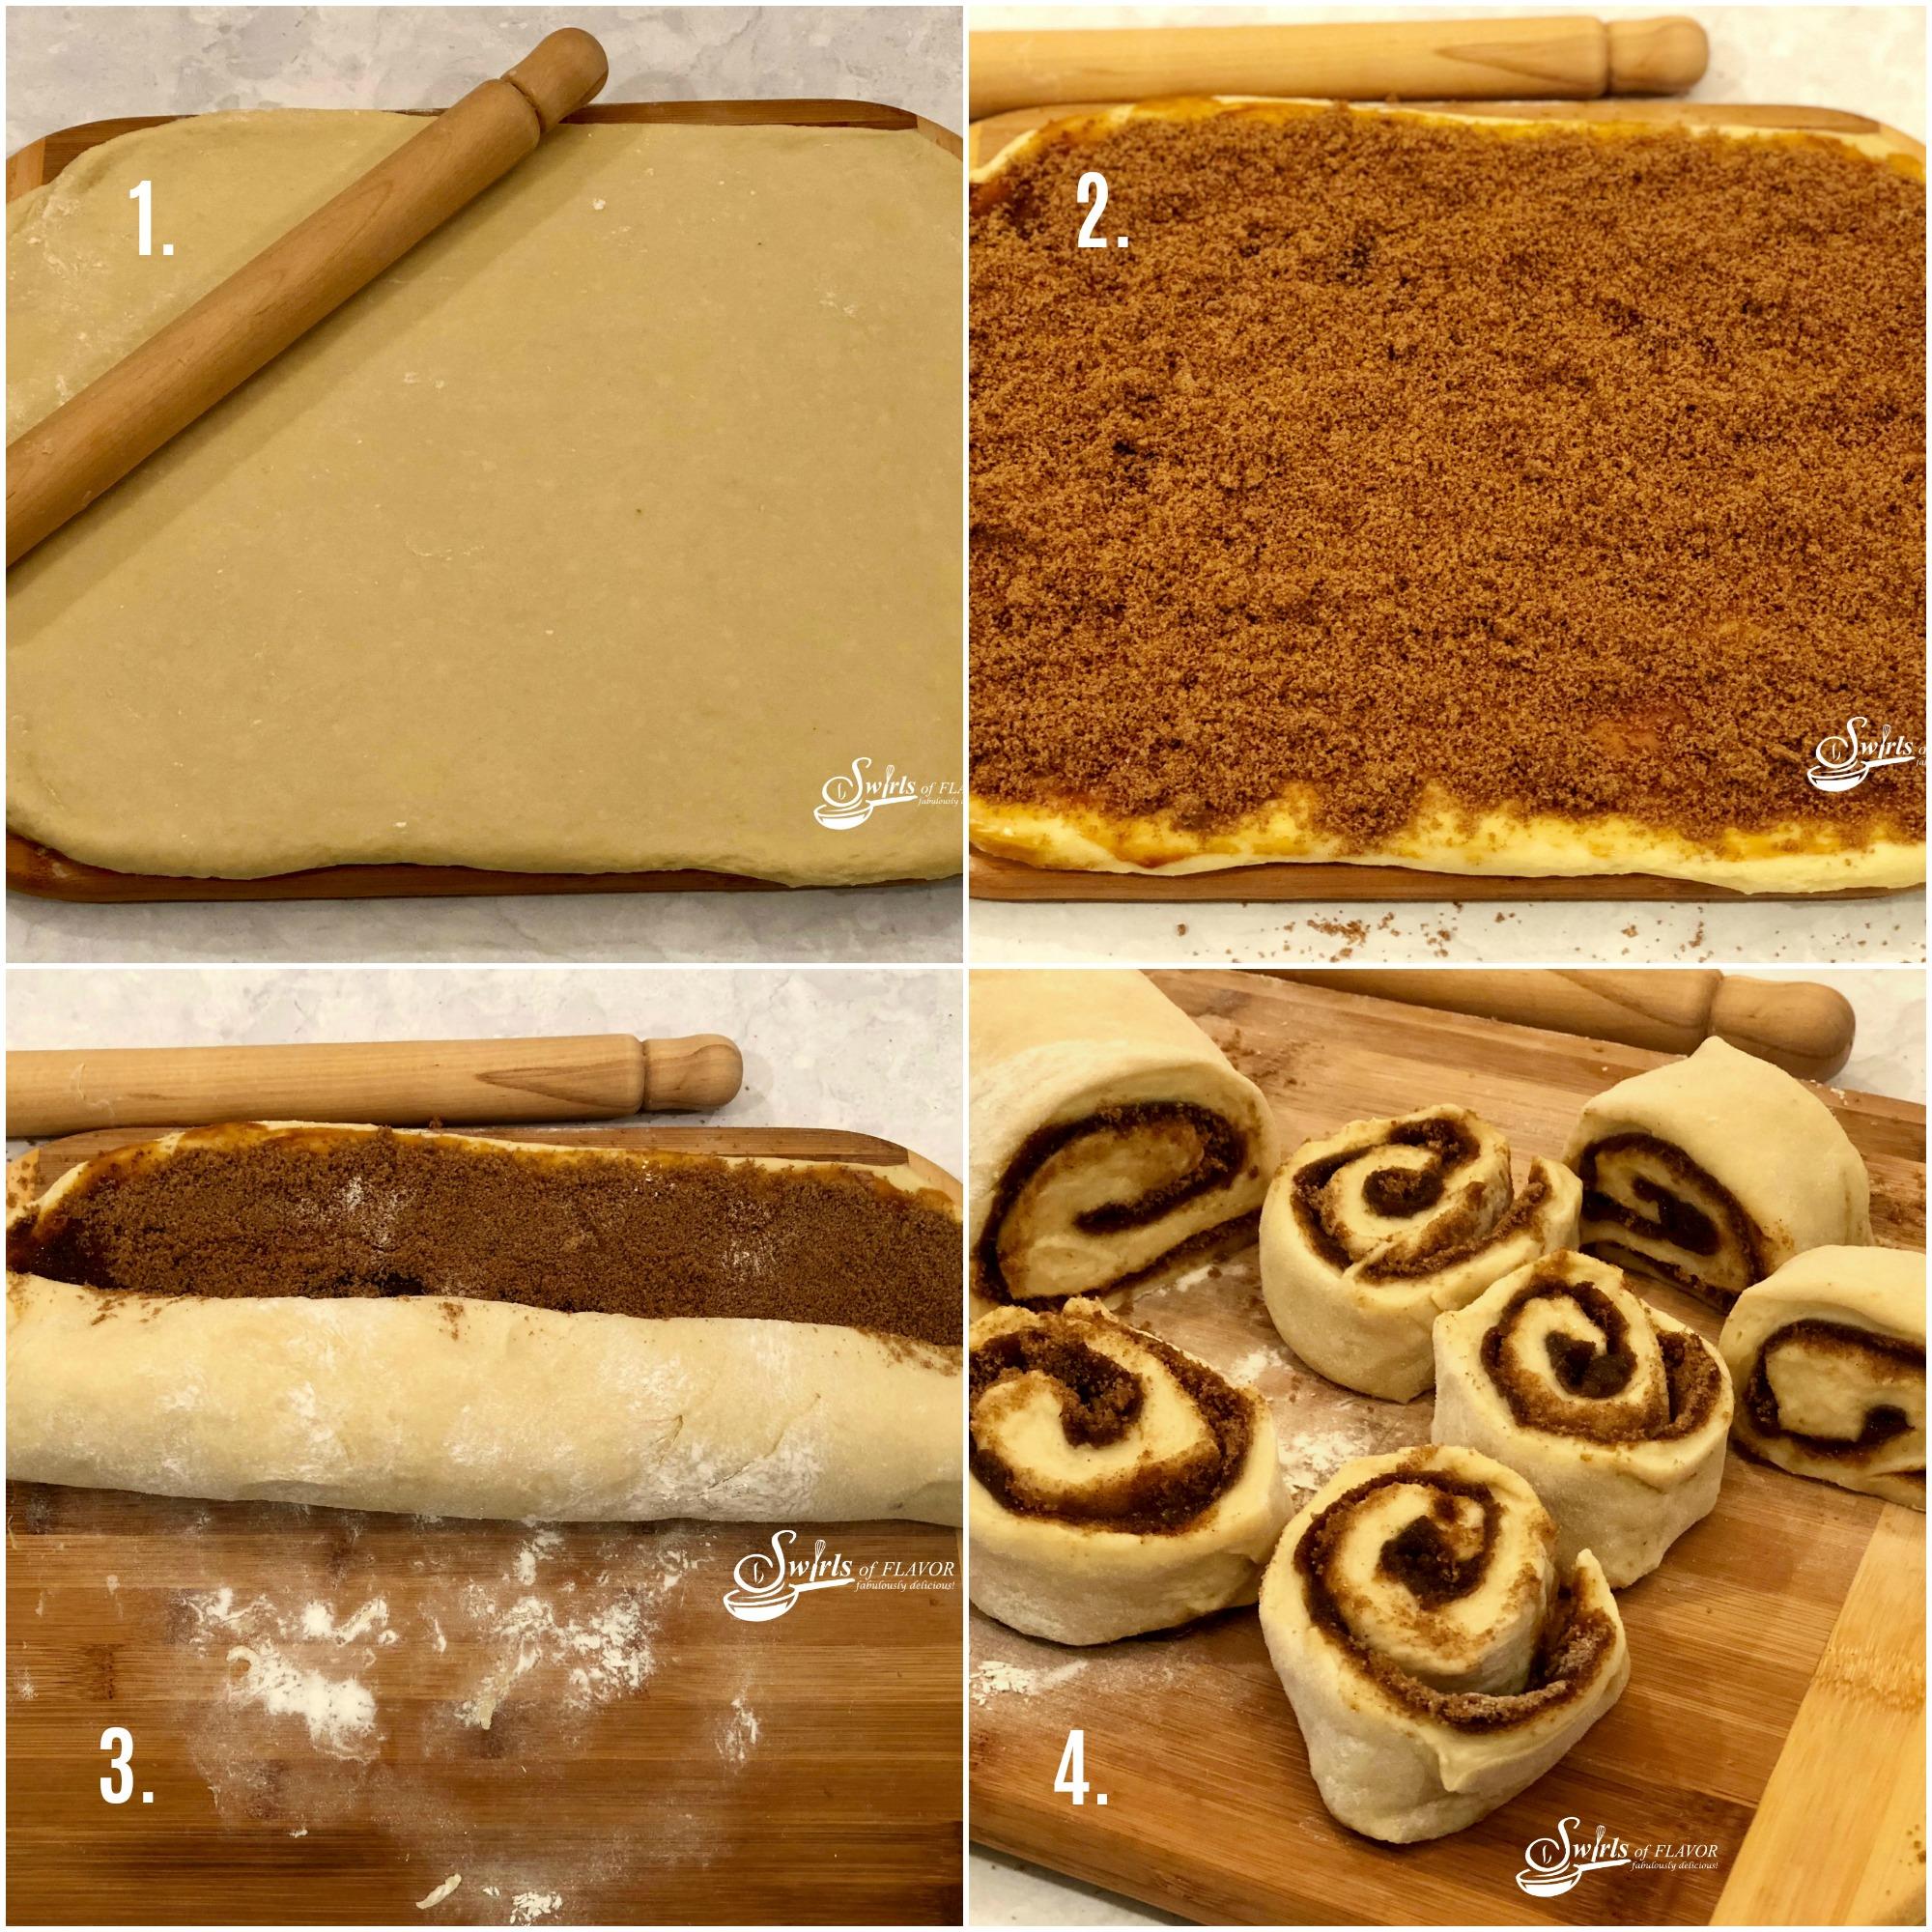 Steps for making cinnamon rolls